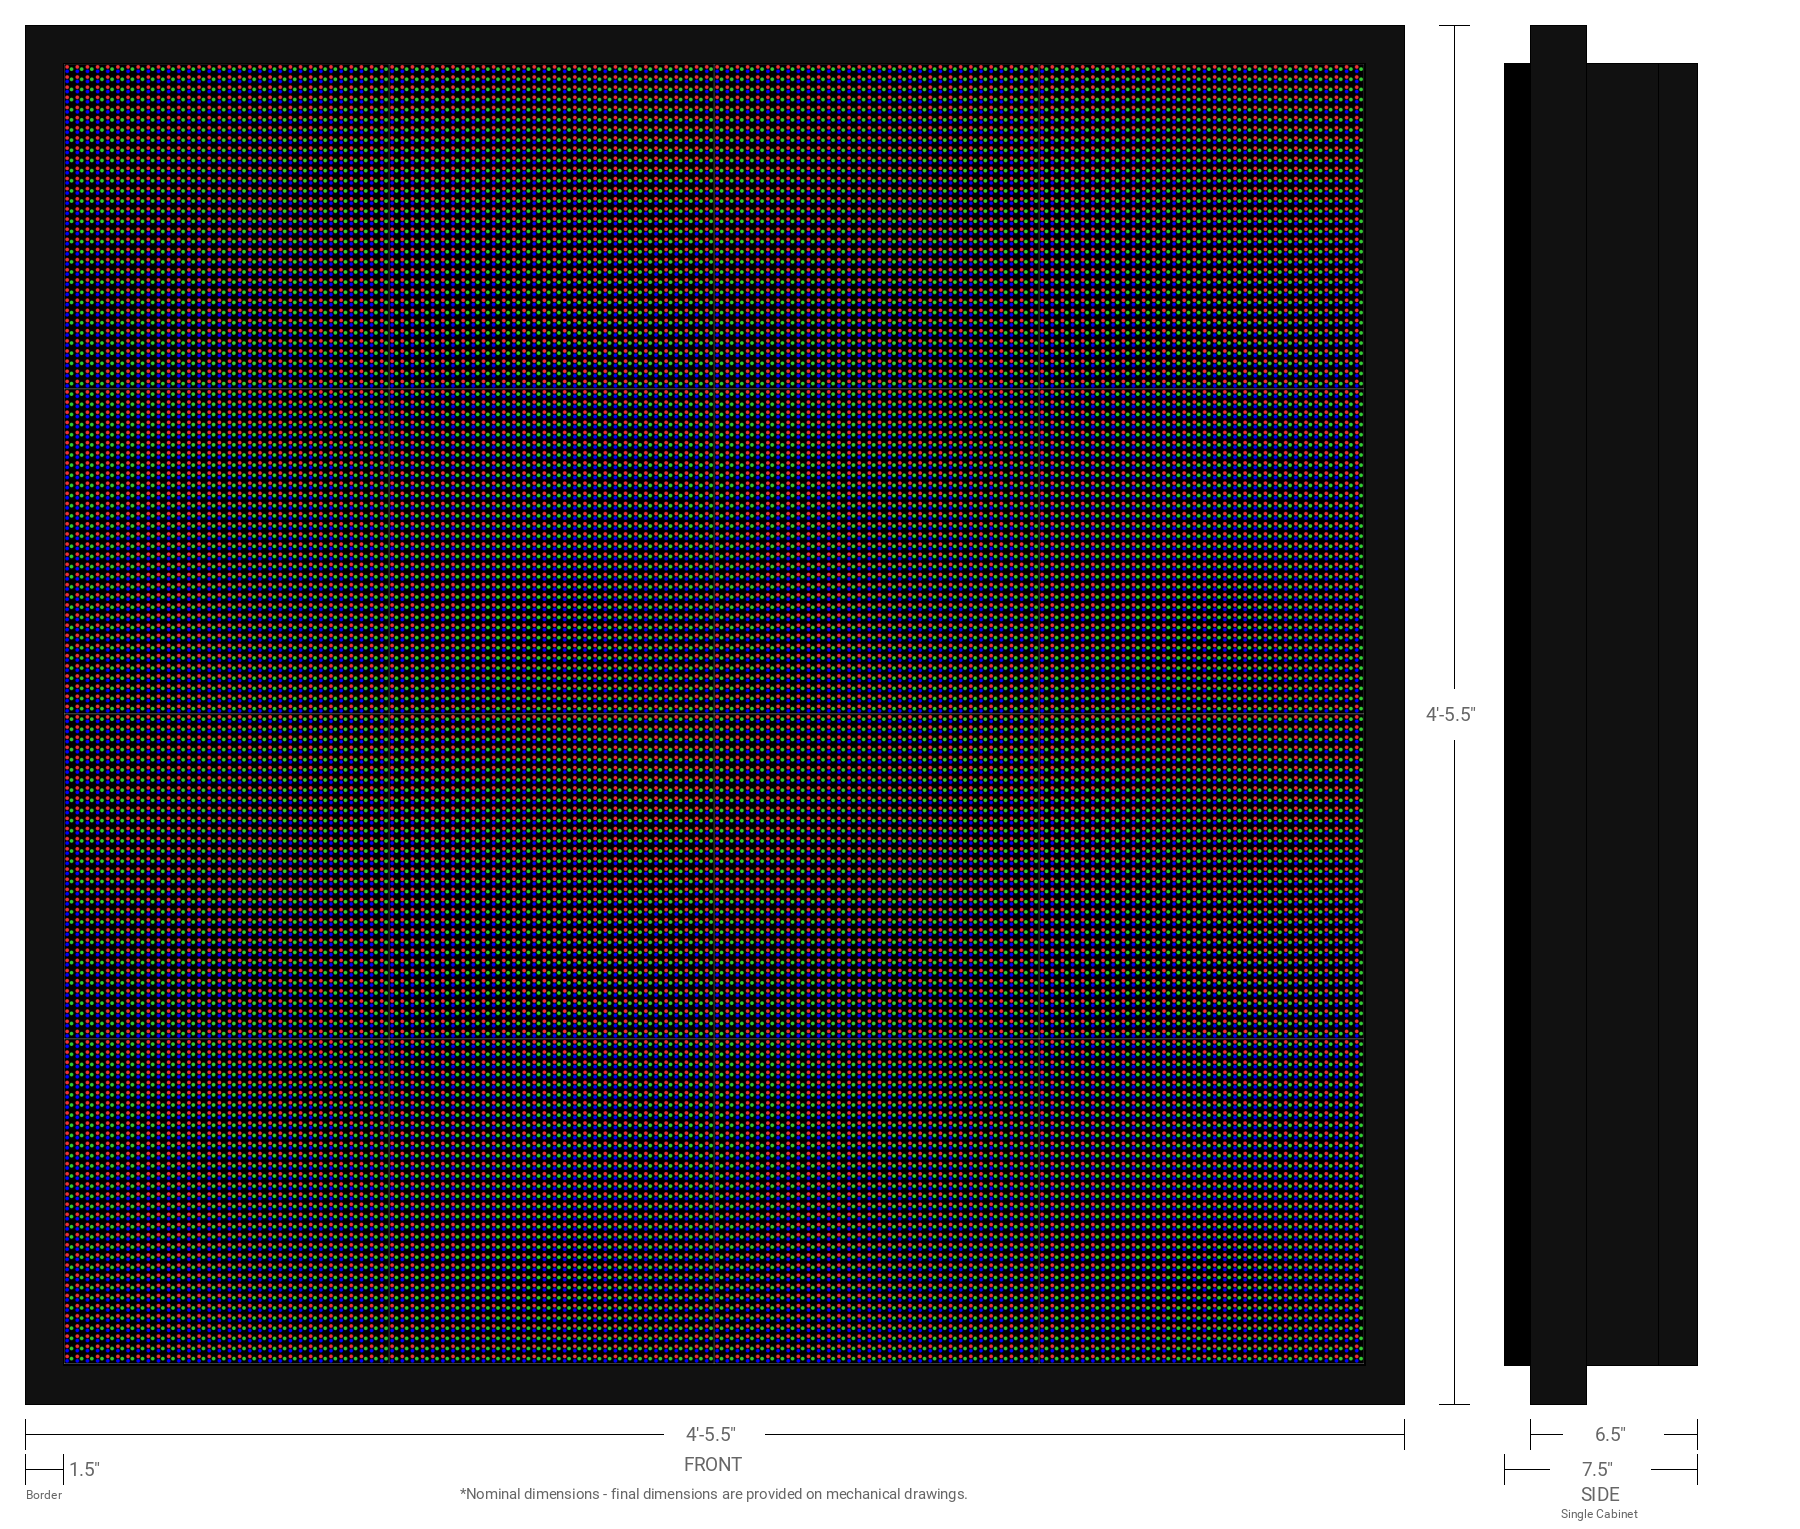 Polaris 10mm 128x128 Single Sided Full Color LED Display